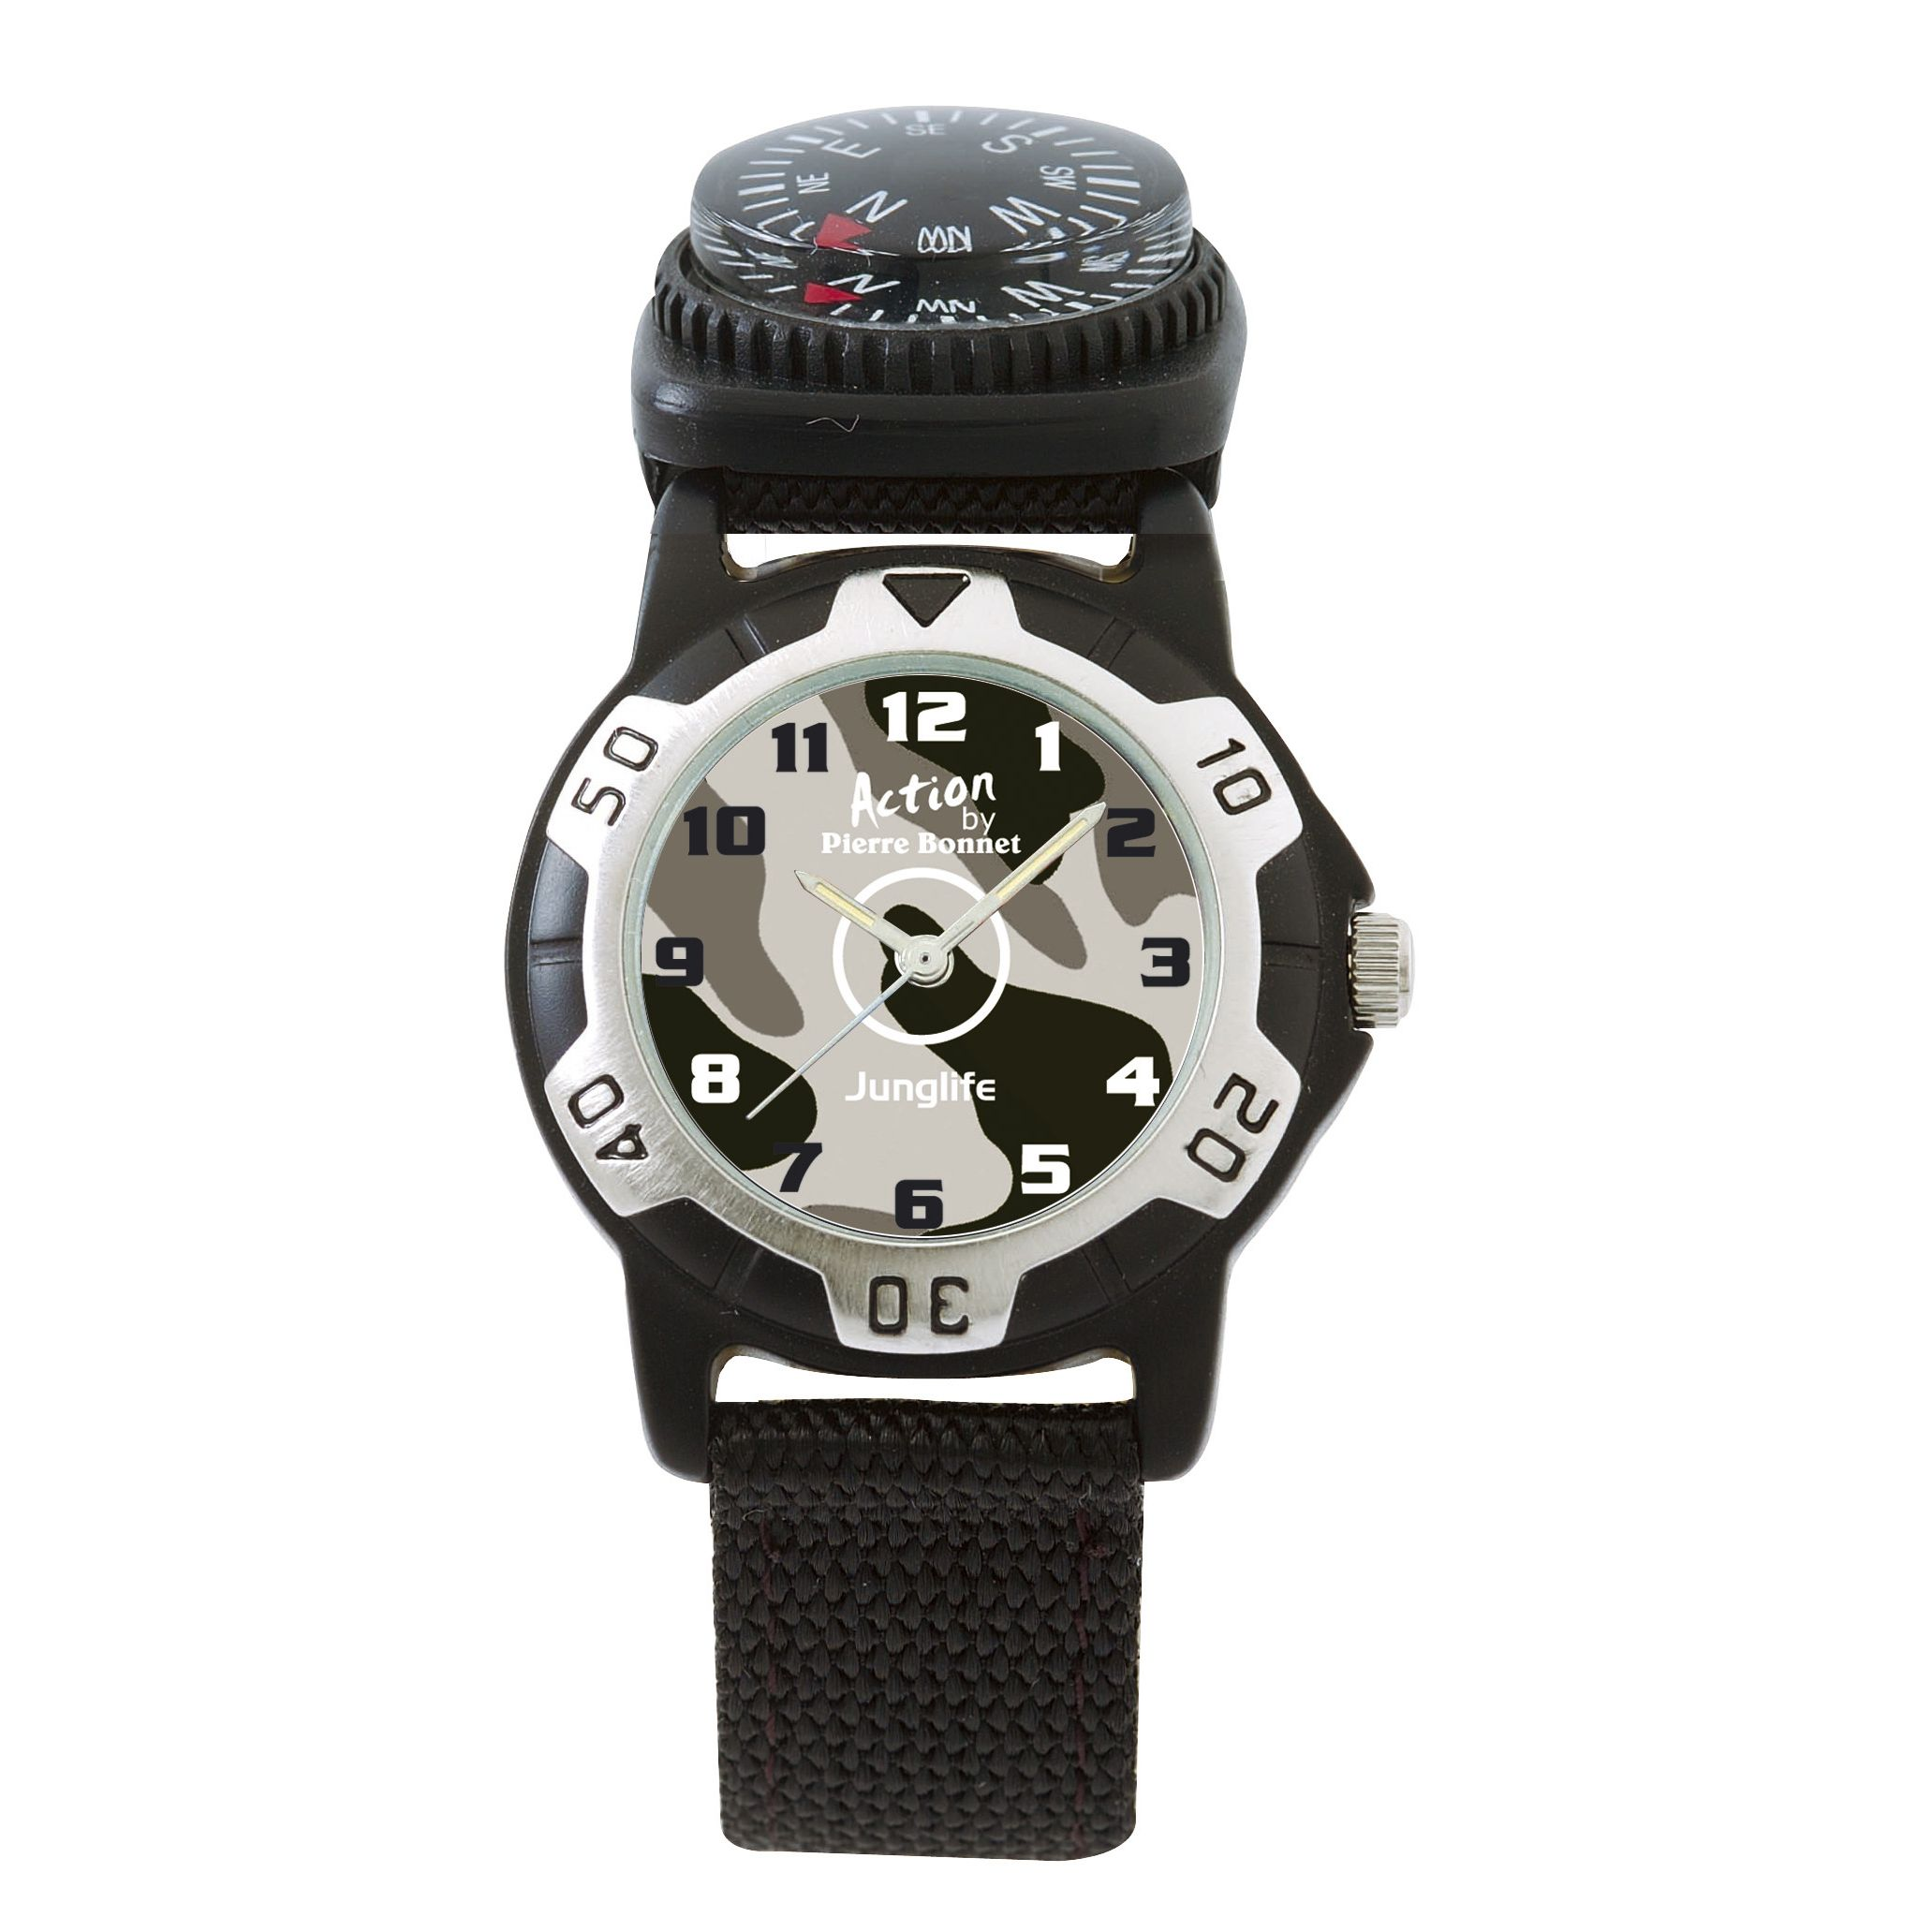 Orologio unisex Pierre Bonnet 9134MG